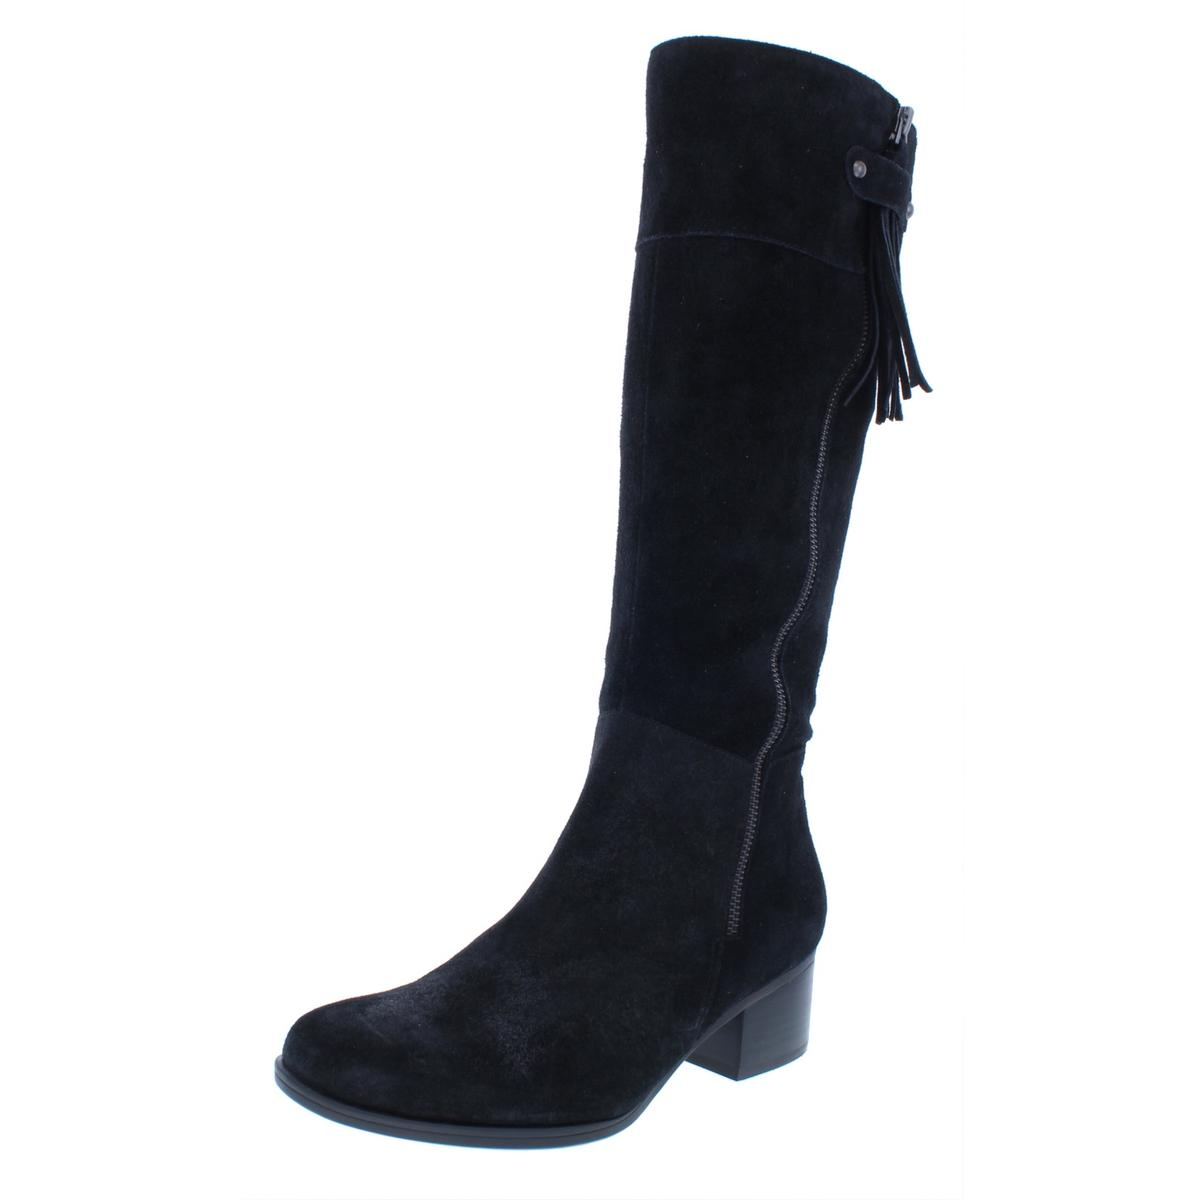 Naturalizer Para Mujer Demi Negro Zapatos botas De Montar medio 7.5 (B, M) BHFO 4366